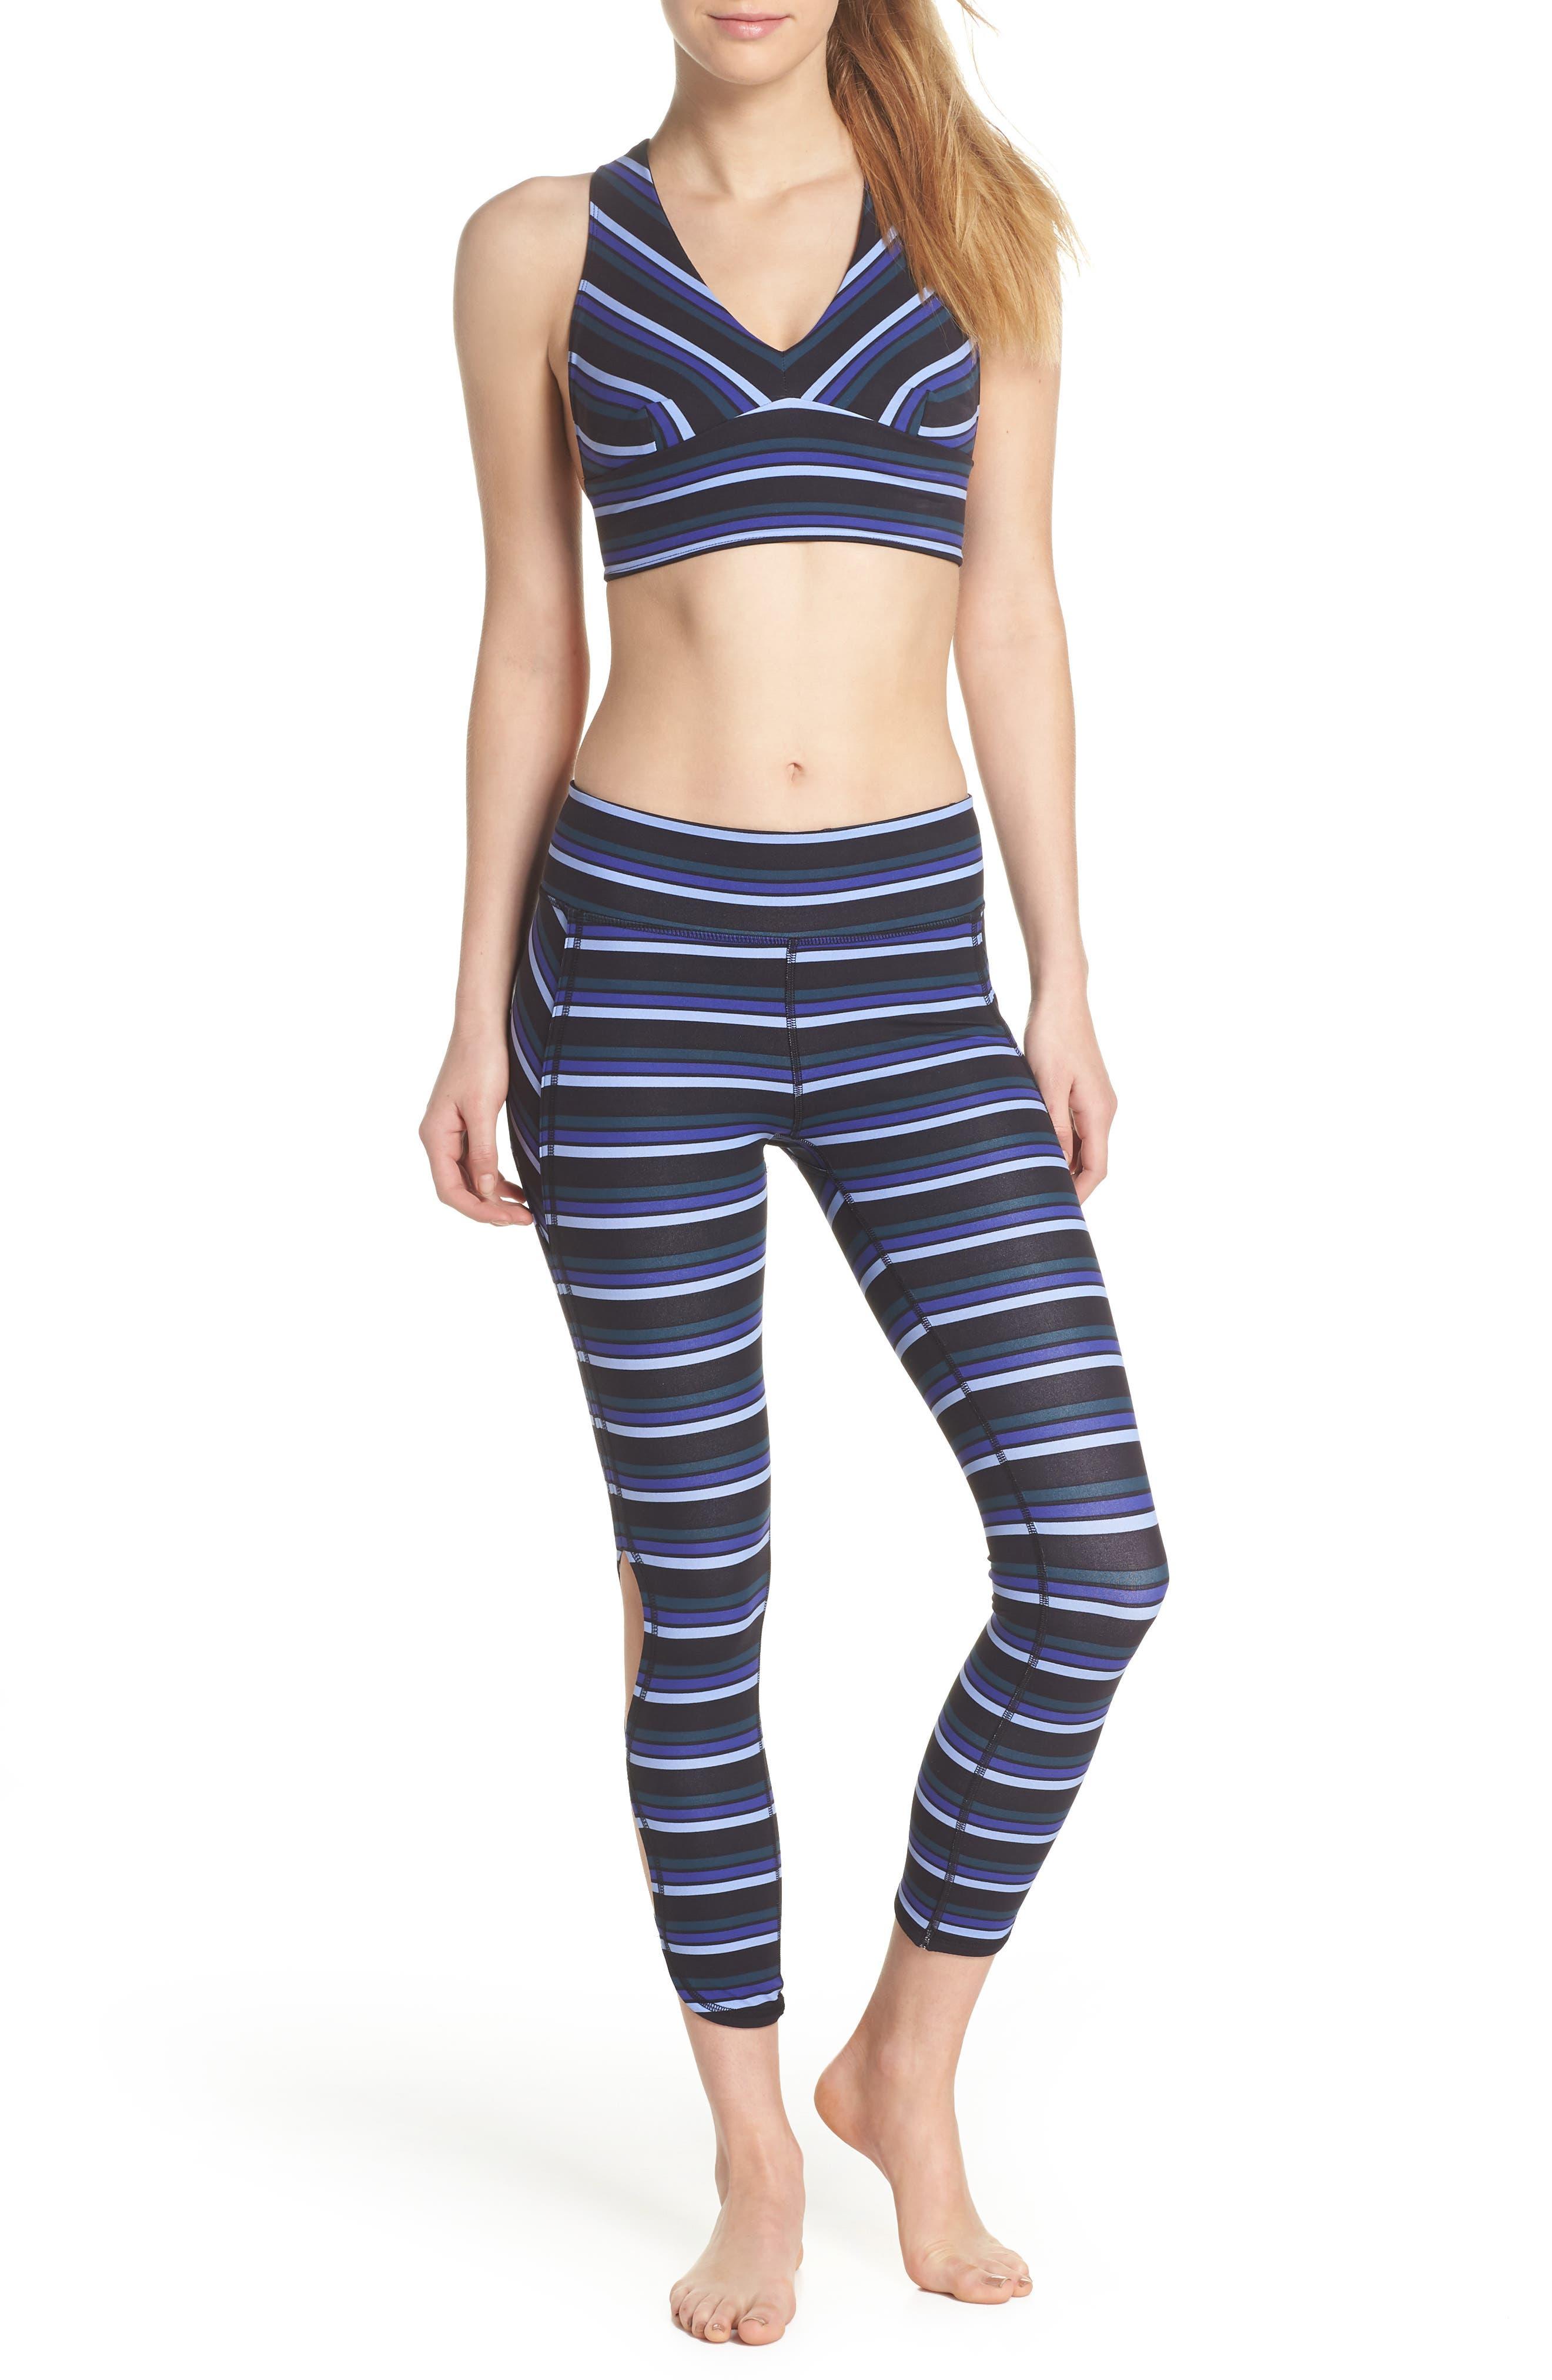 FP Movement Stripe Infinity Leggings,                         Main,                         color, Black Combo